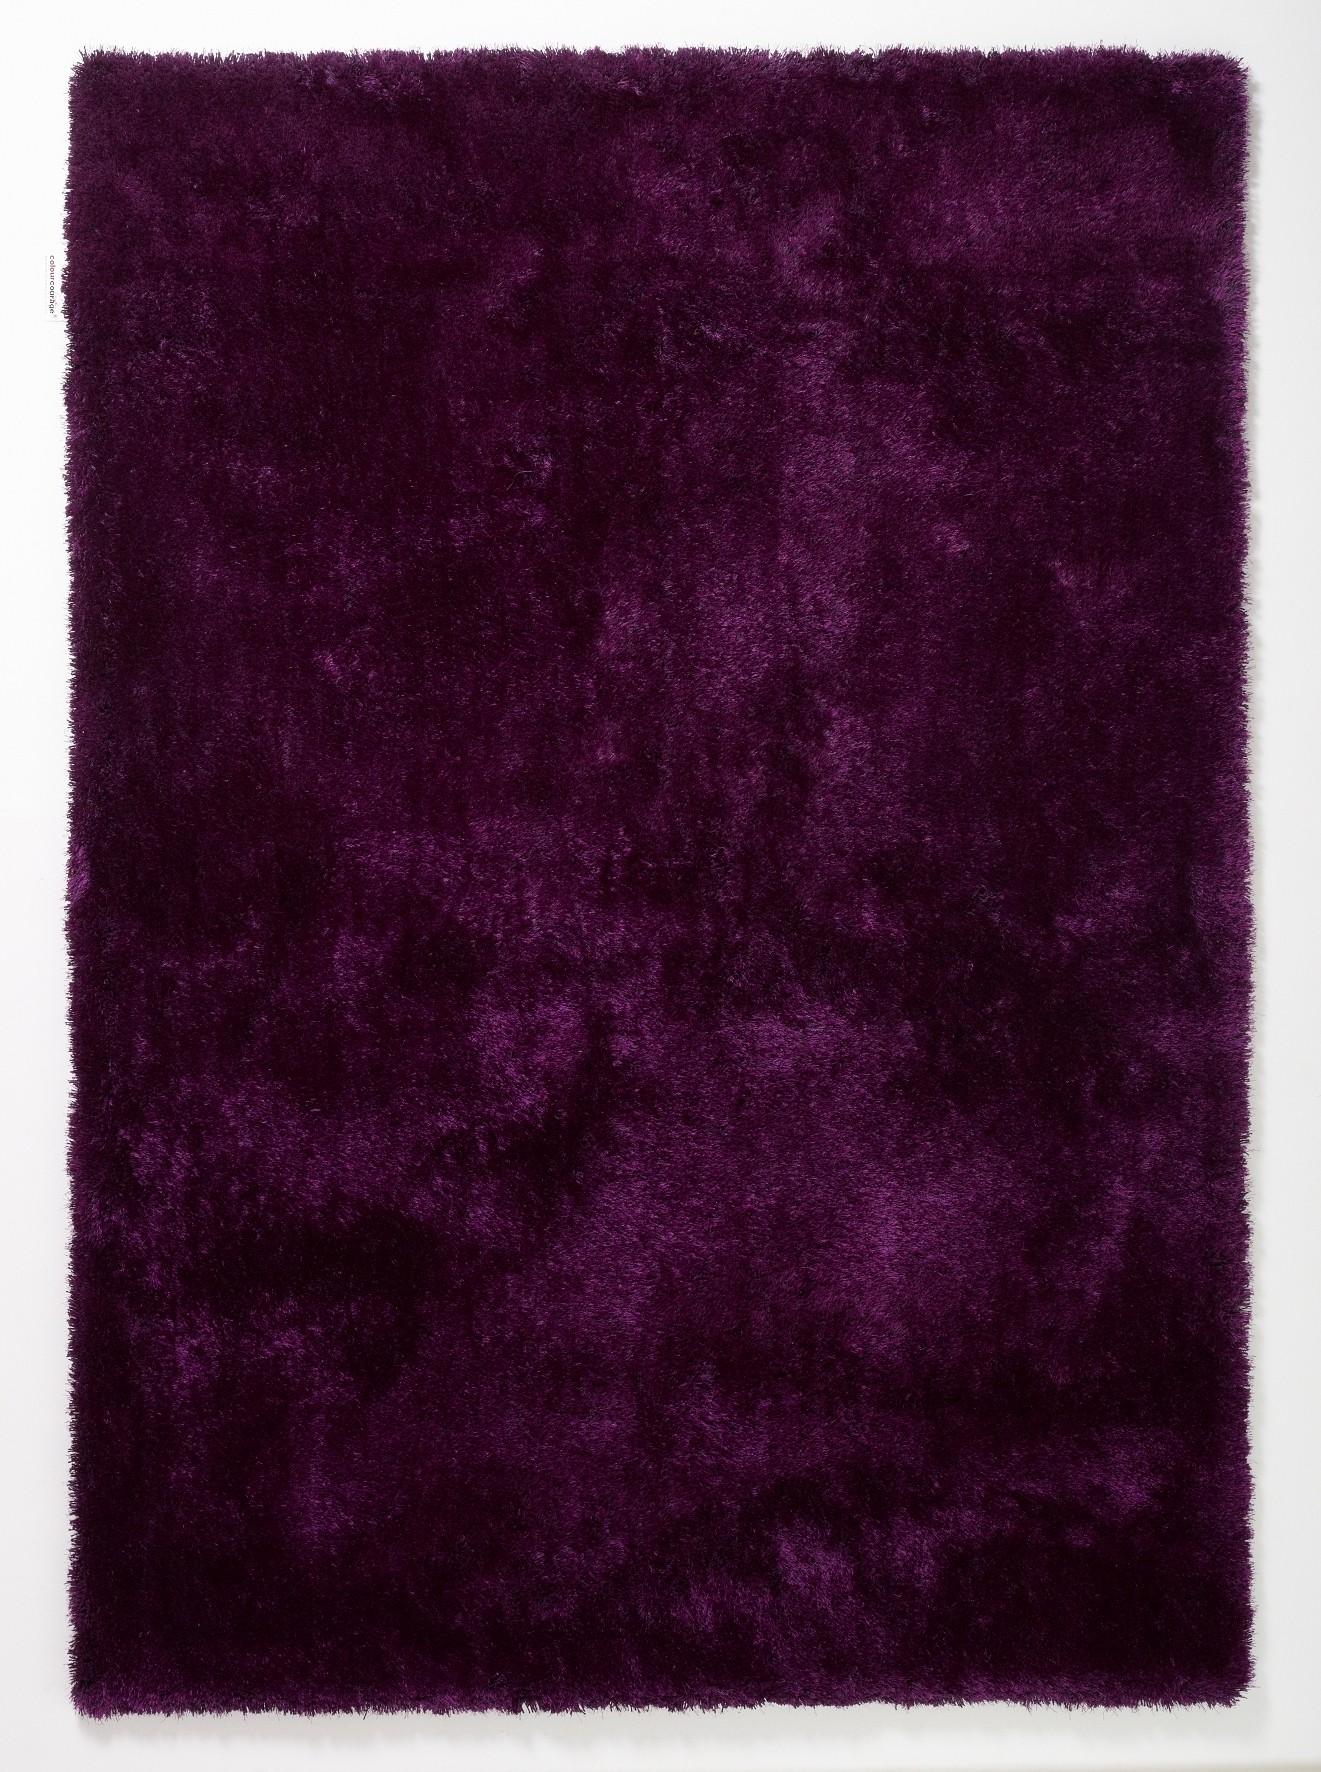 Tapijt Aubergine - paars - 170x240cm, Colourcourage